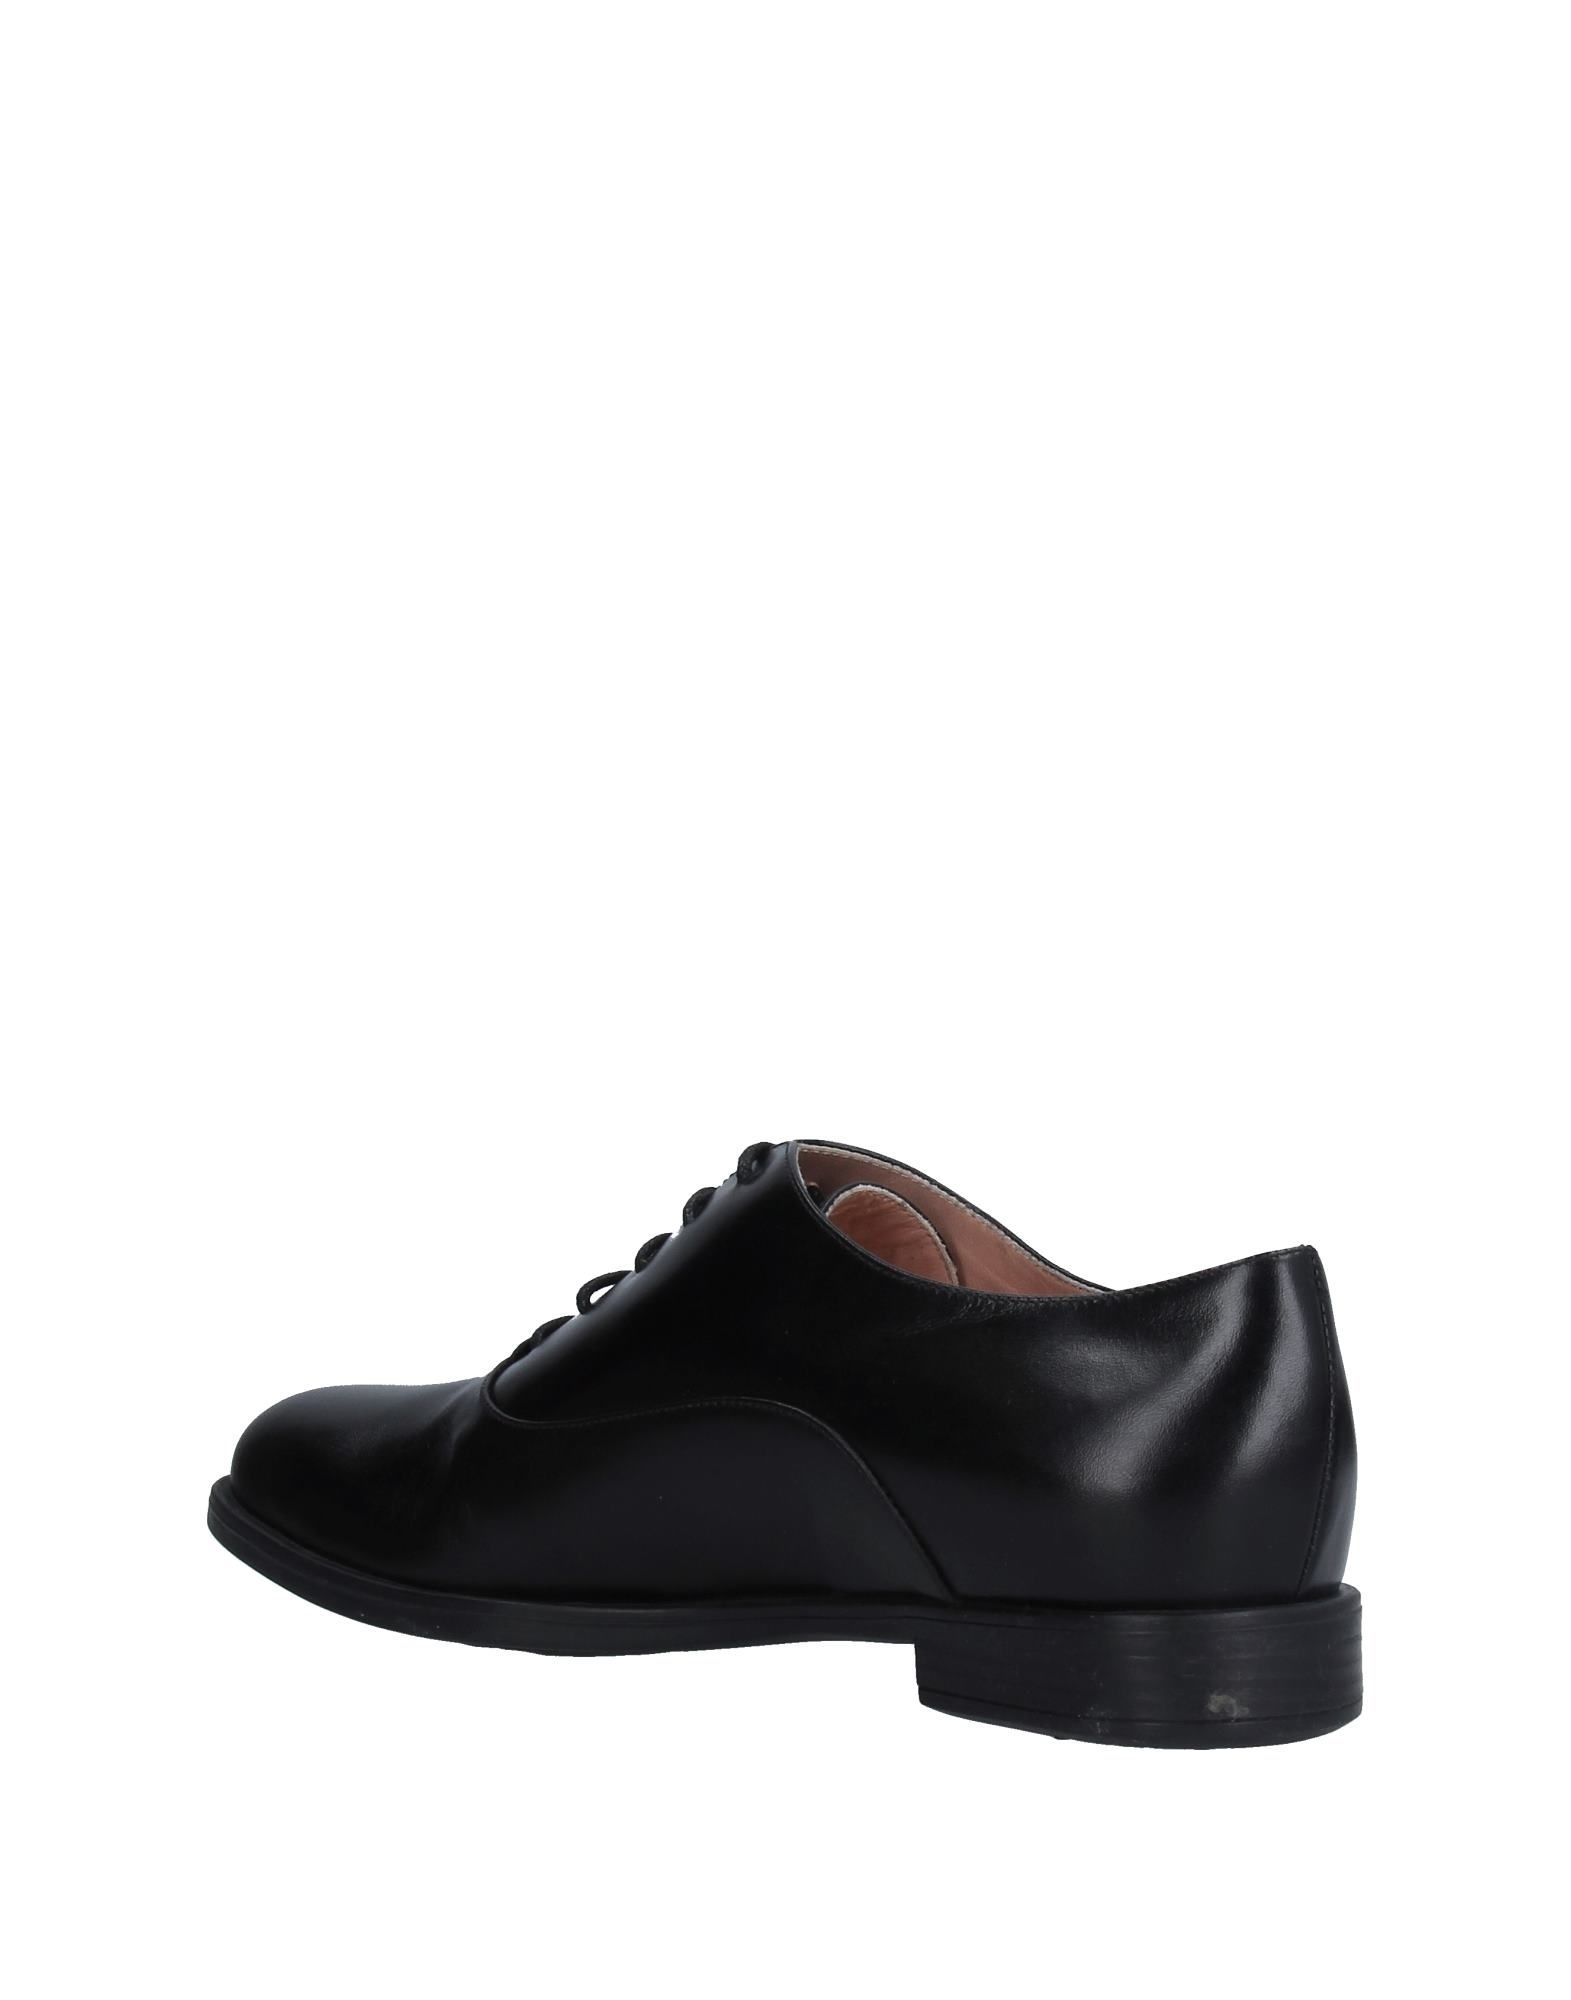 Chaussures À Lacets Marco Barbabella Femme - Chaussures À Lacets Marco Barbabella sur